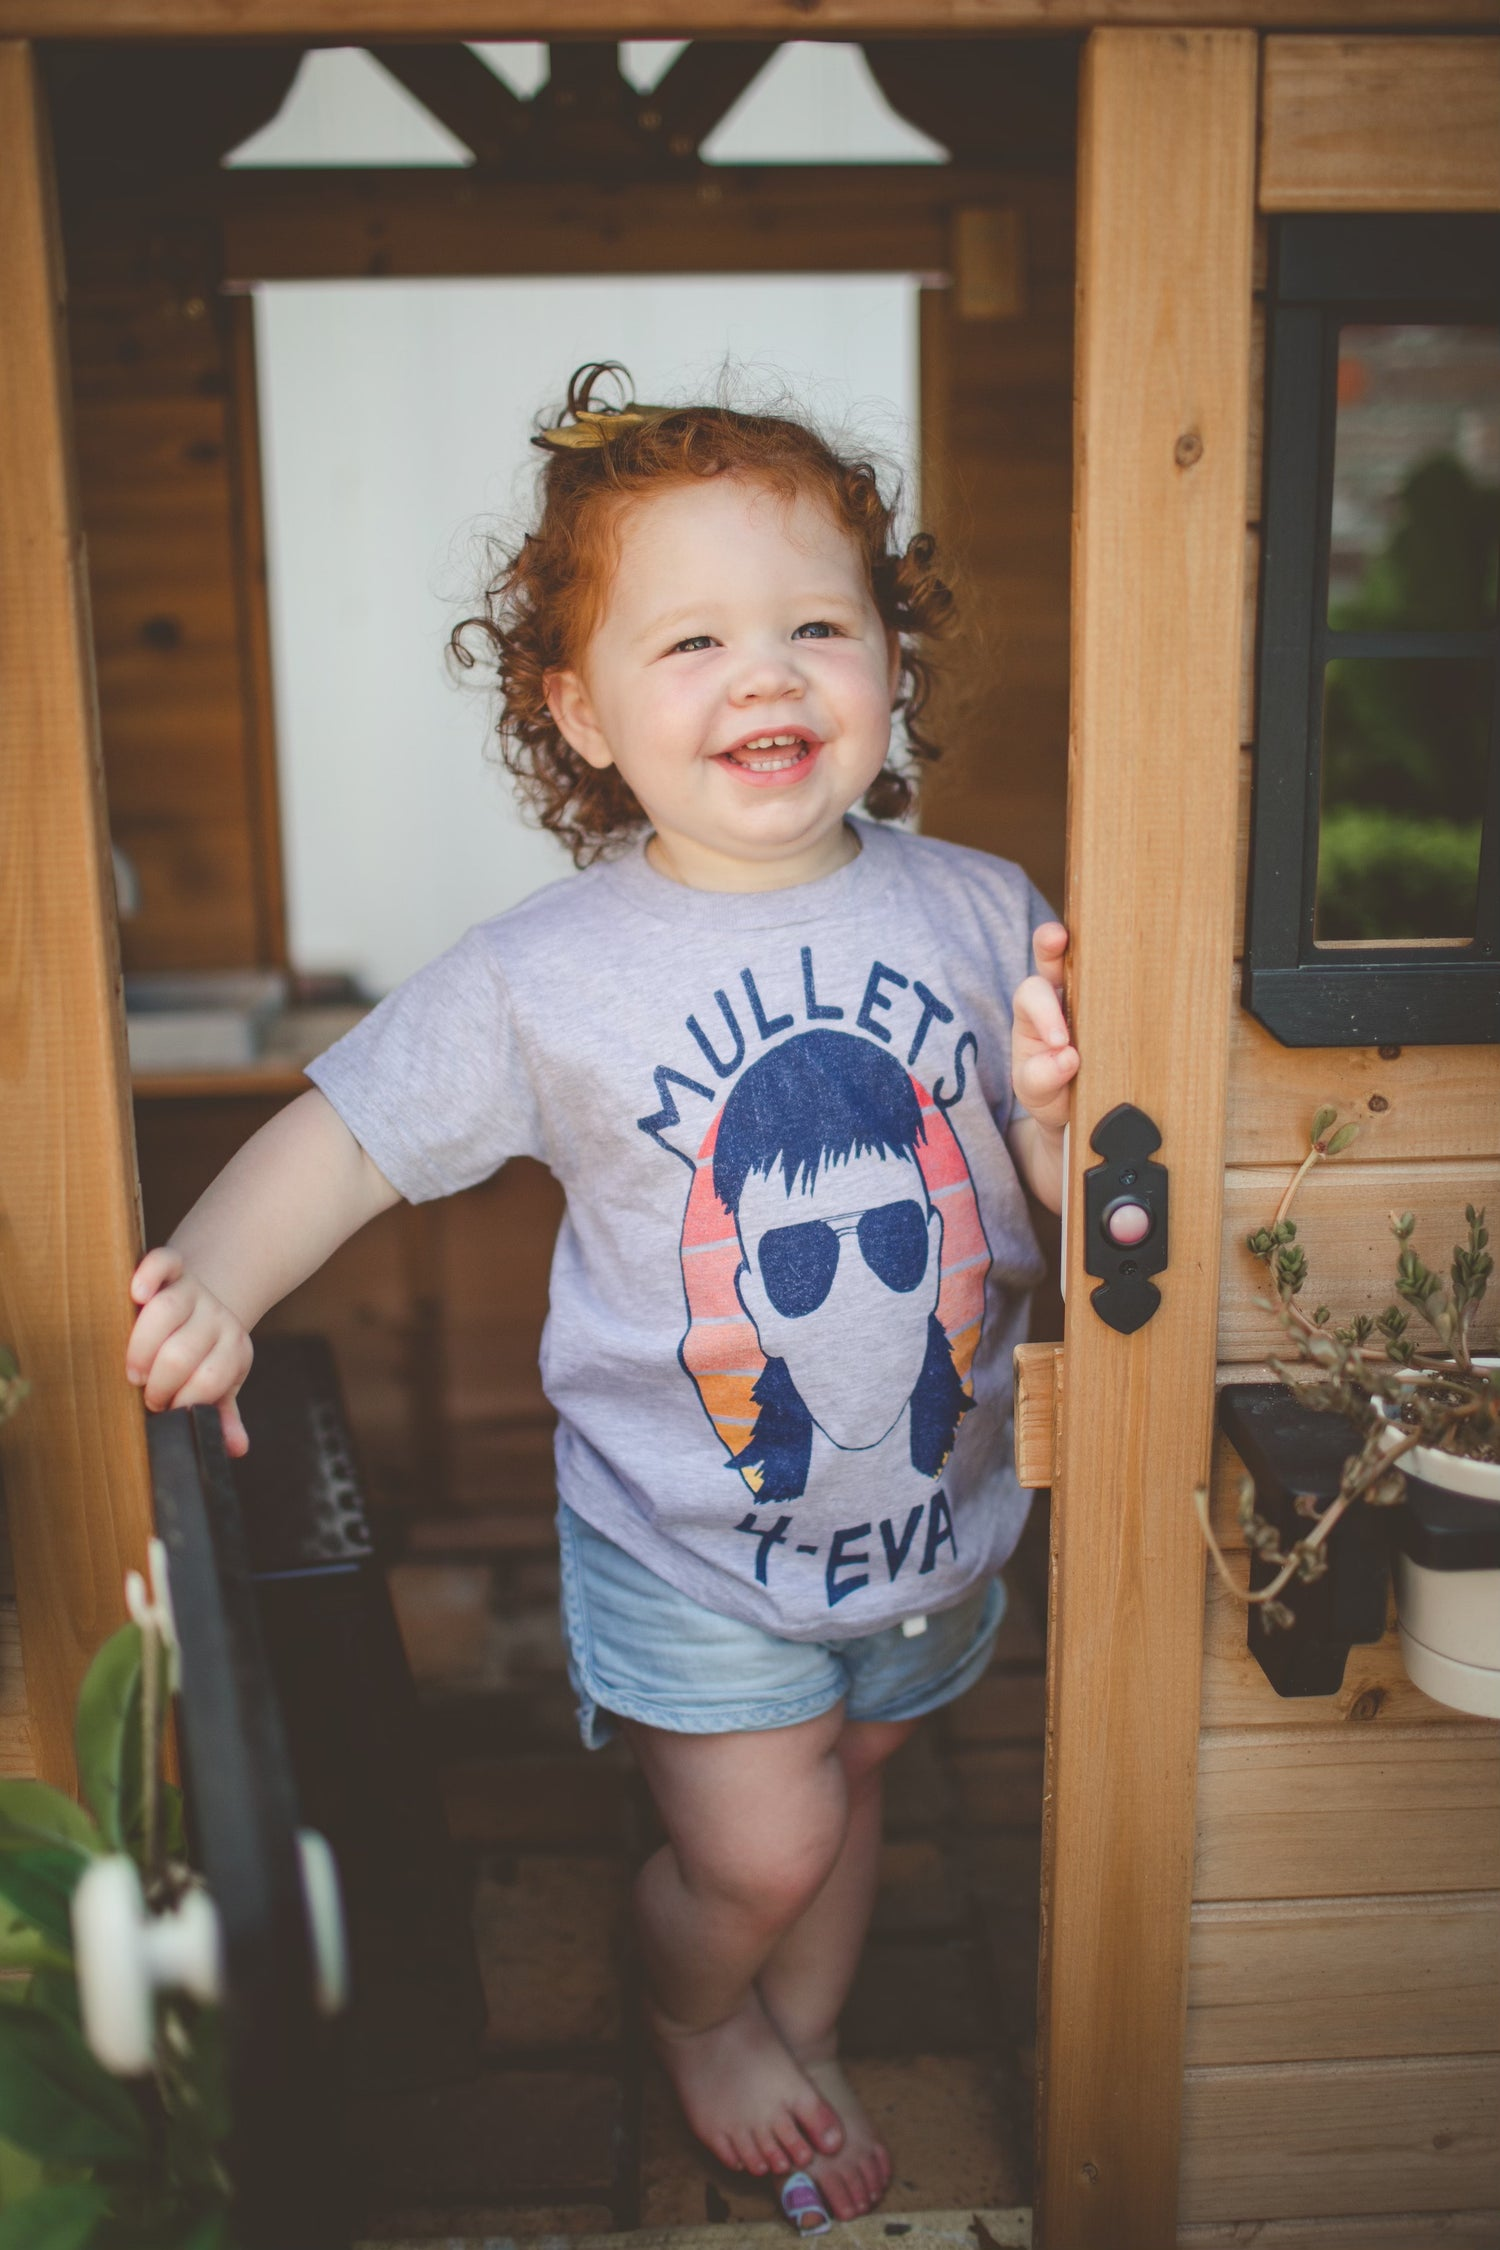 Image of Youth Mullets 4 Eva Short Sleeve Tee (Dryfit)